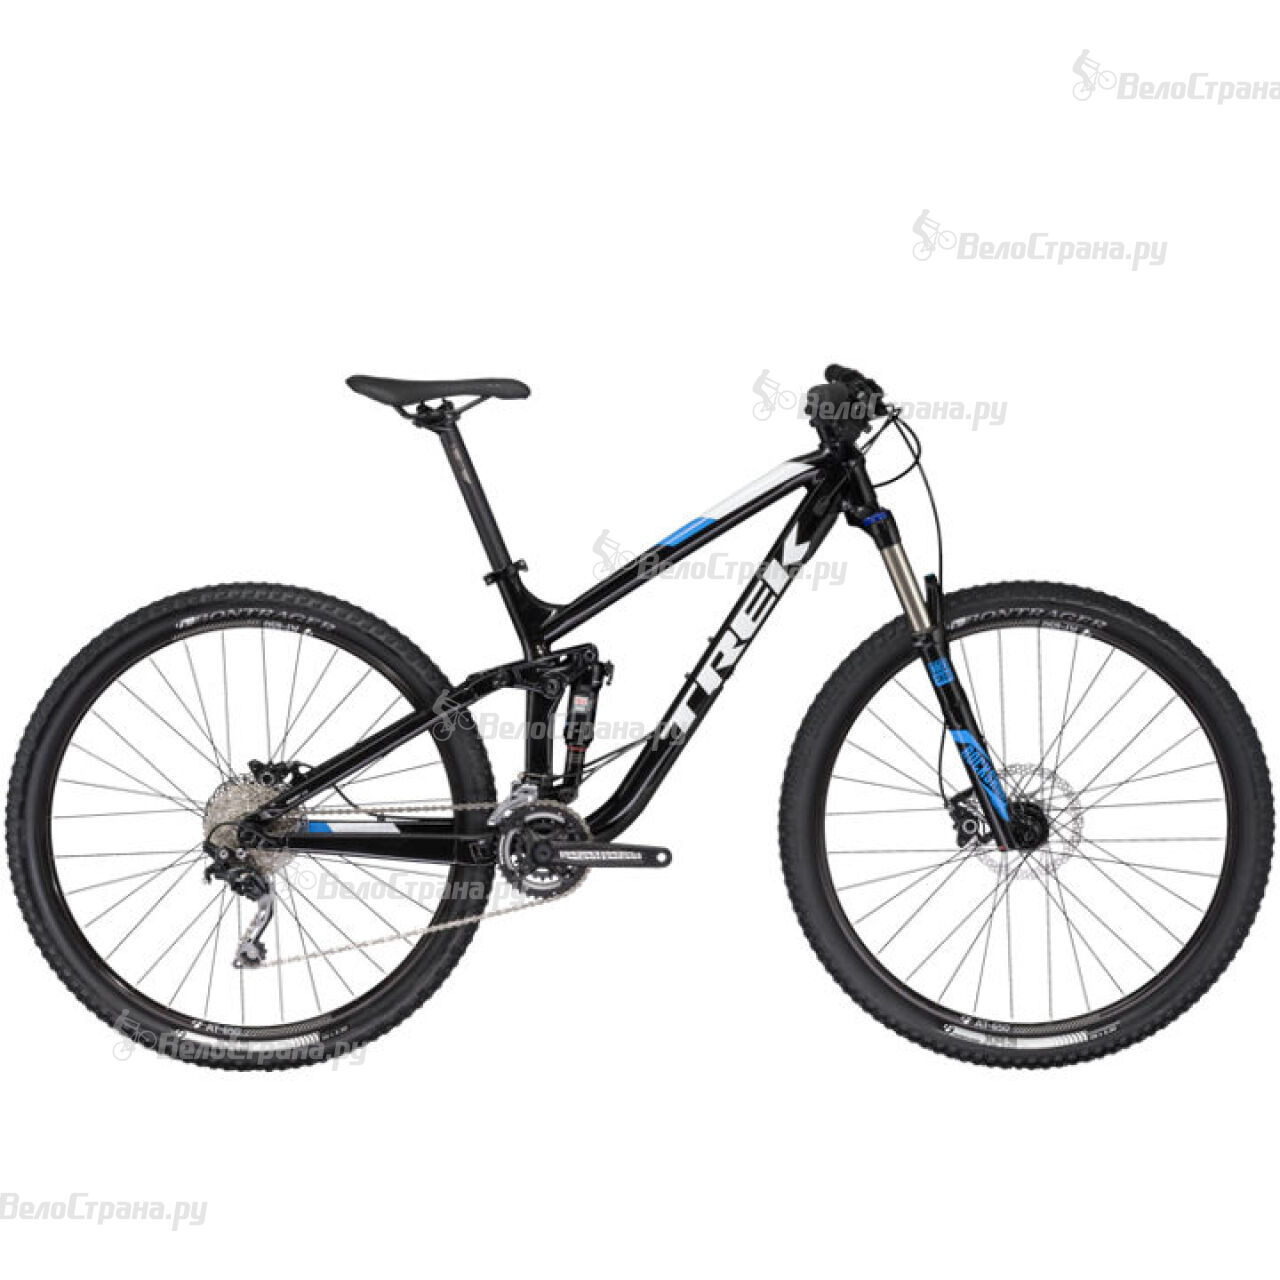 Велосипед Trek Fuel EX 5 29 (2017)